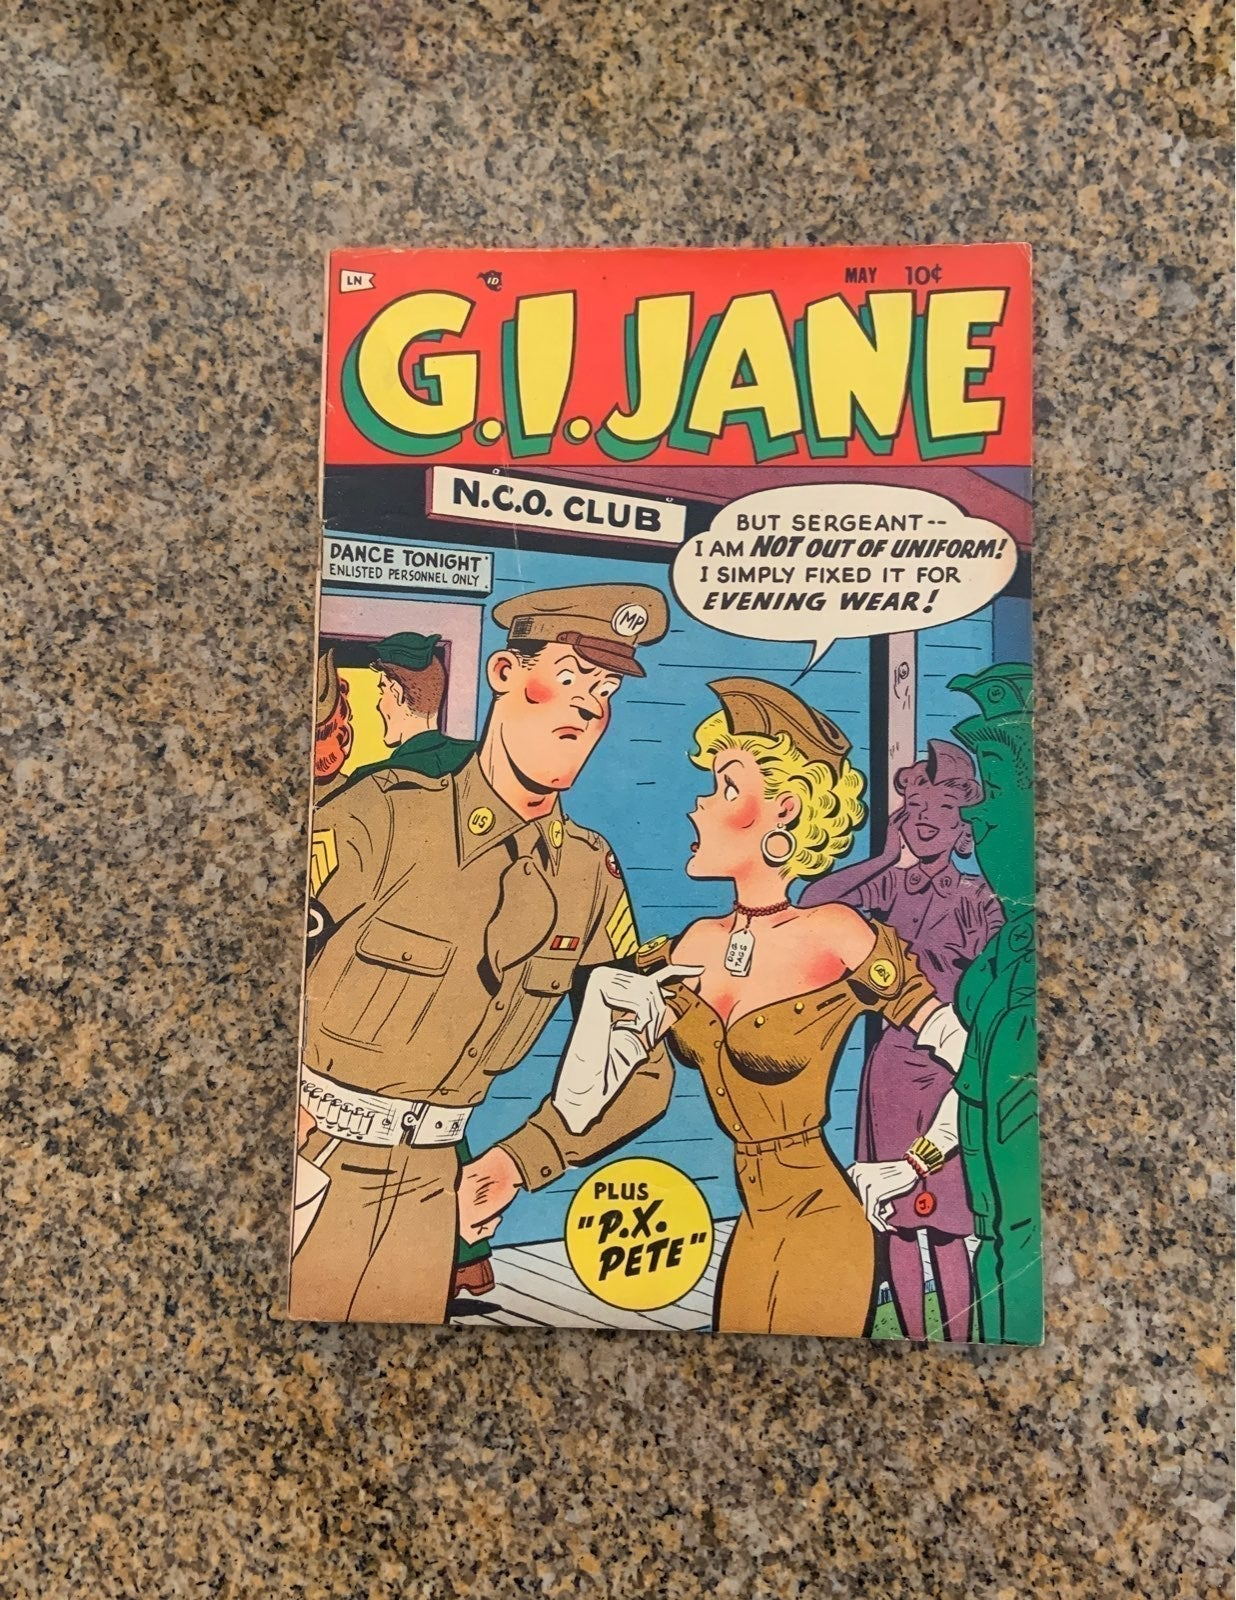 Comic G.I. Jane #7